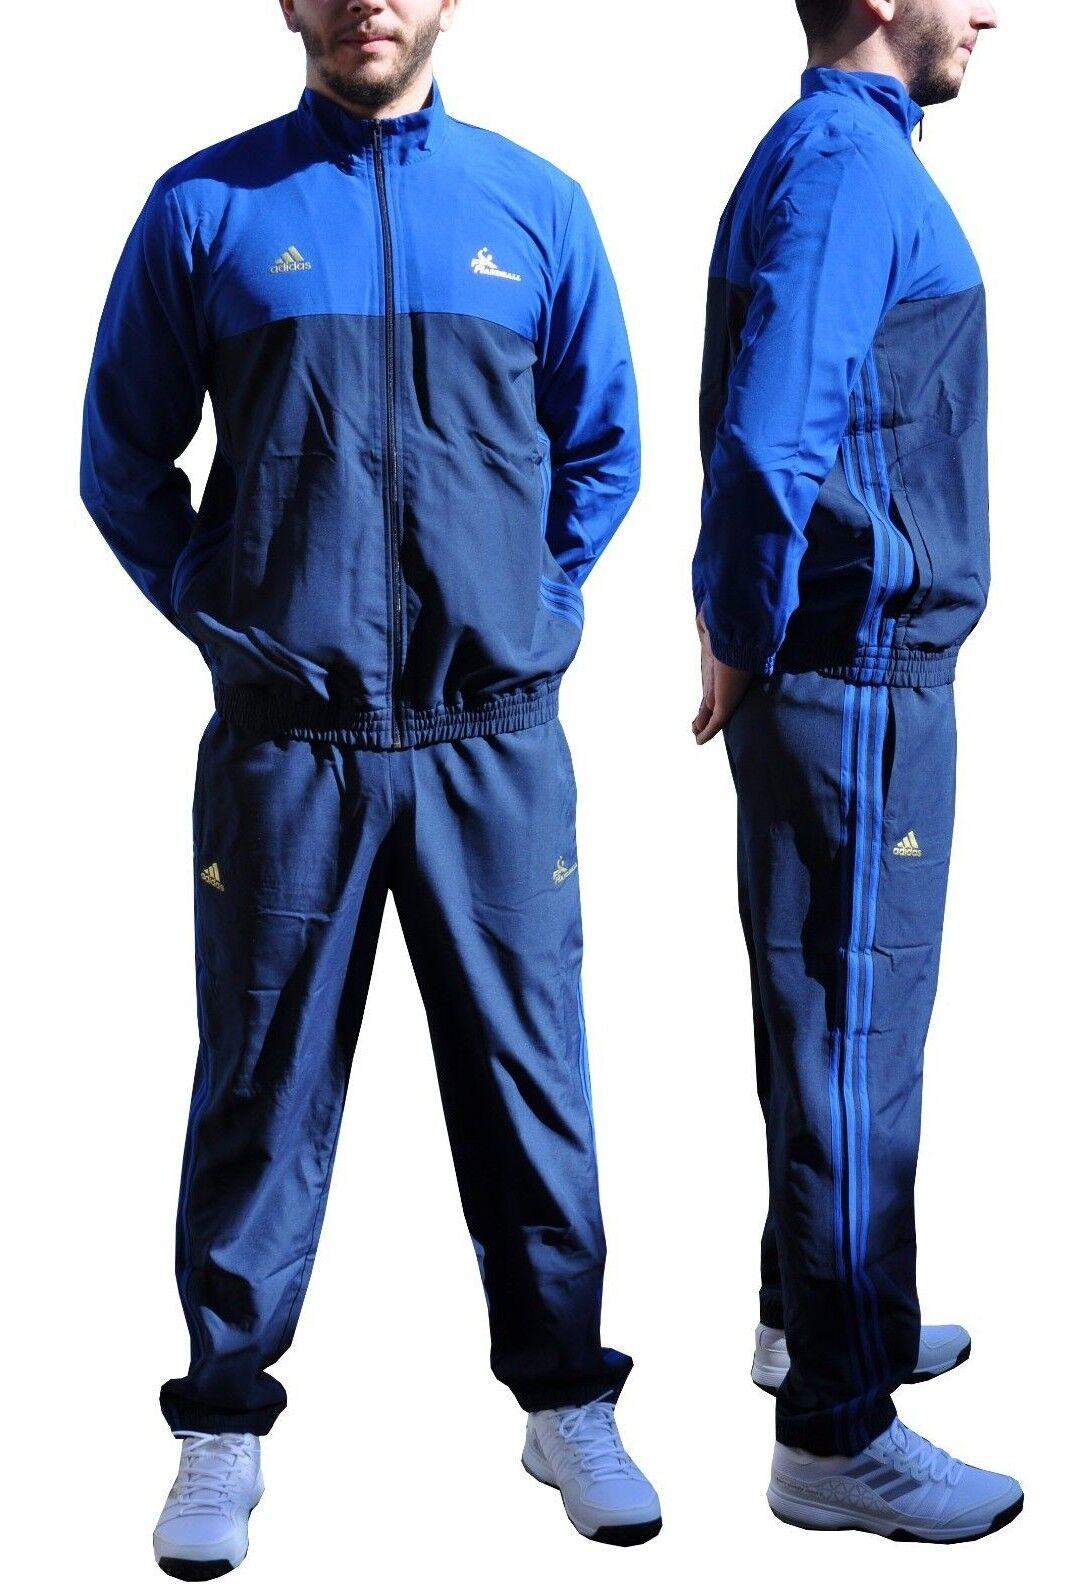 Adidas Trainingsanzug Hose Vergleich Test +++ Adidas